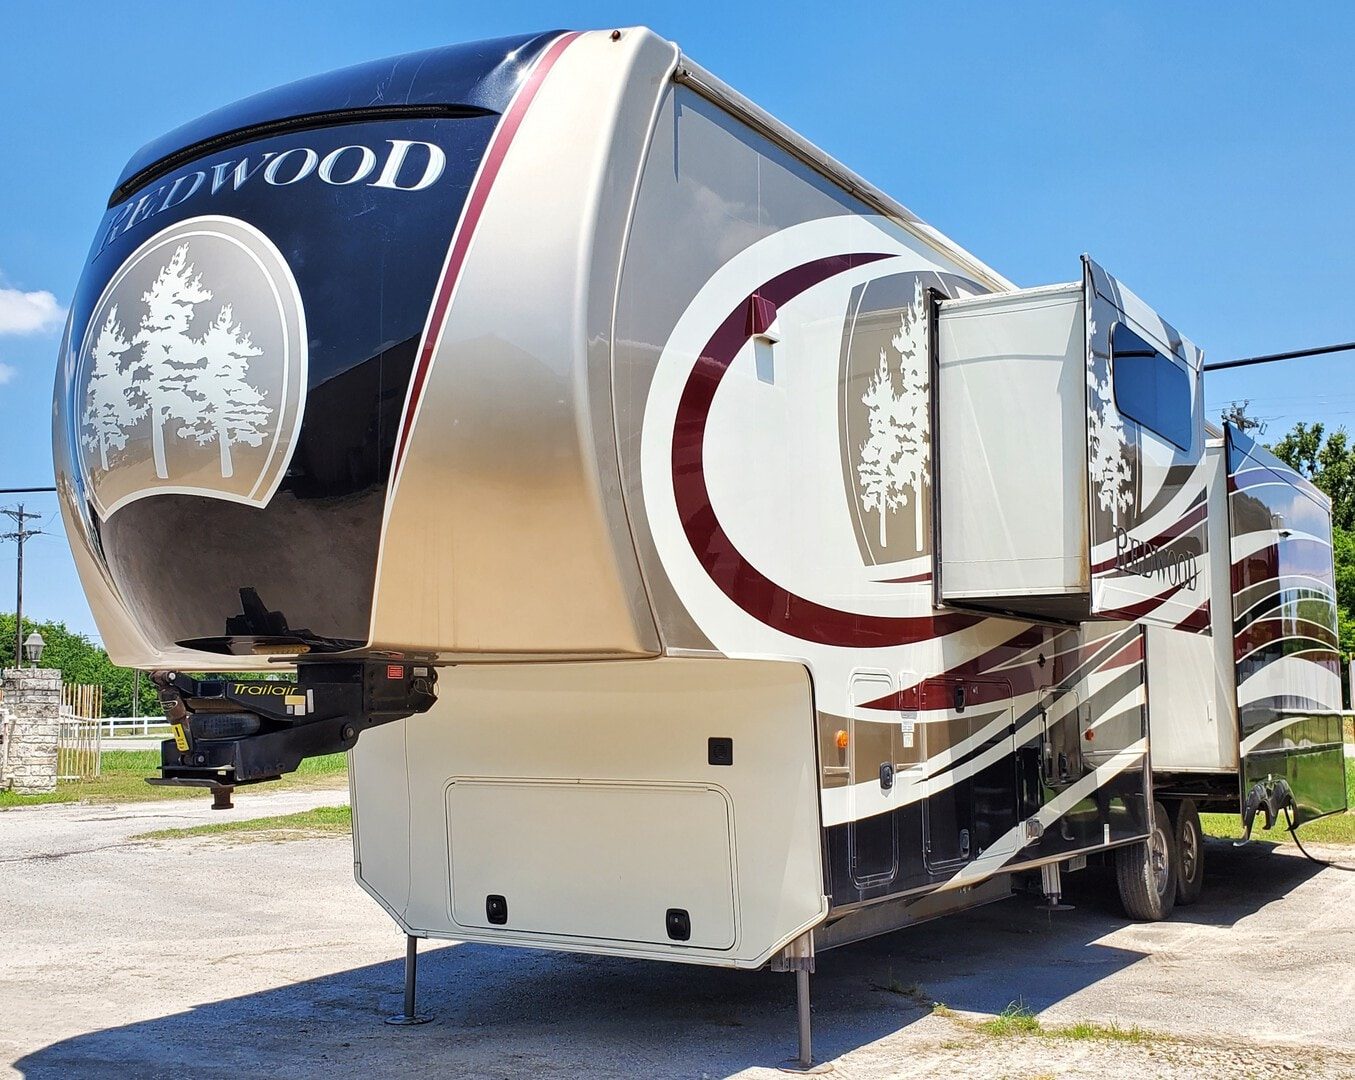 Used, 2017, Redwood, Redwood RW39MB, Fifth Wheels